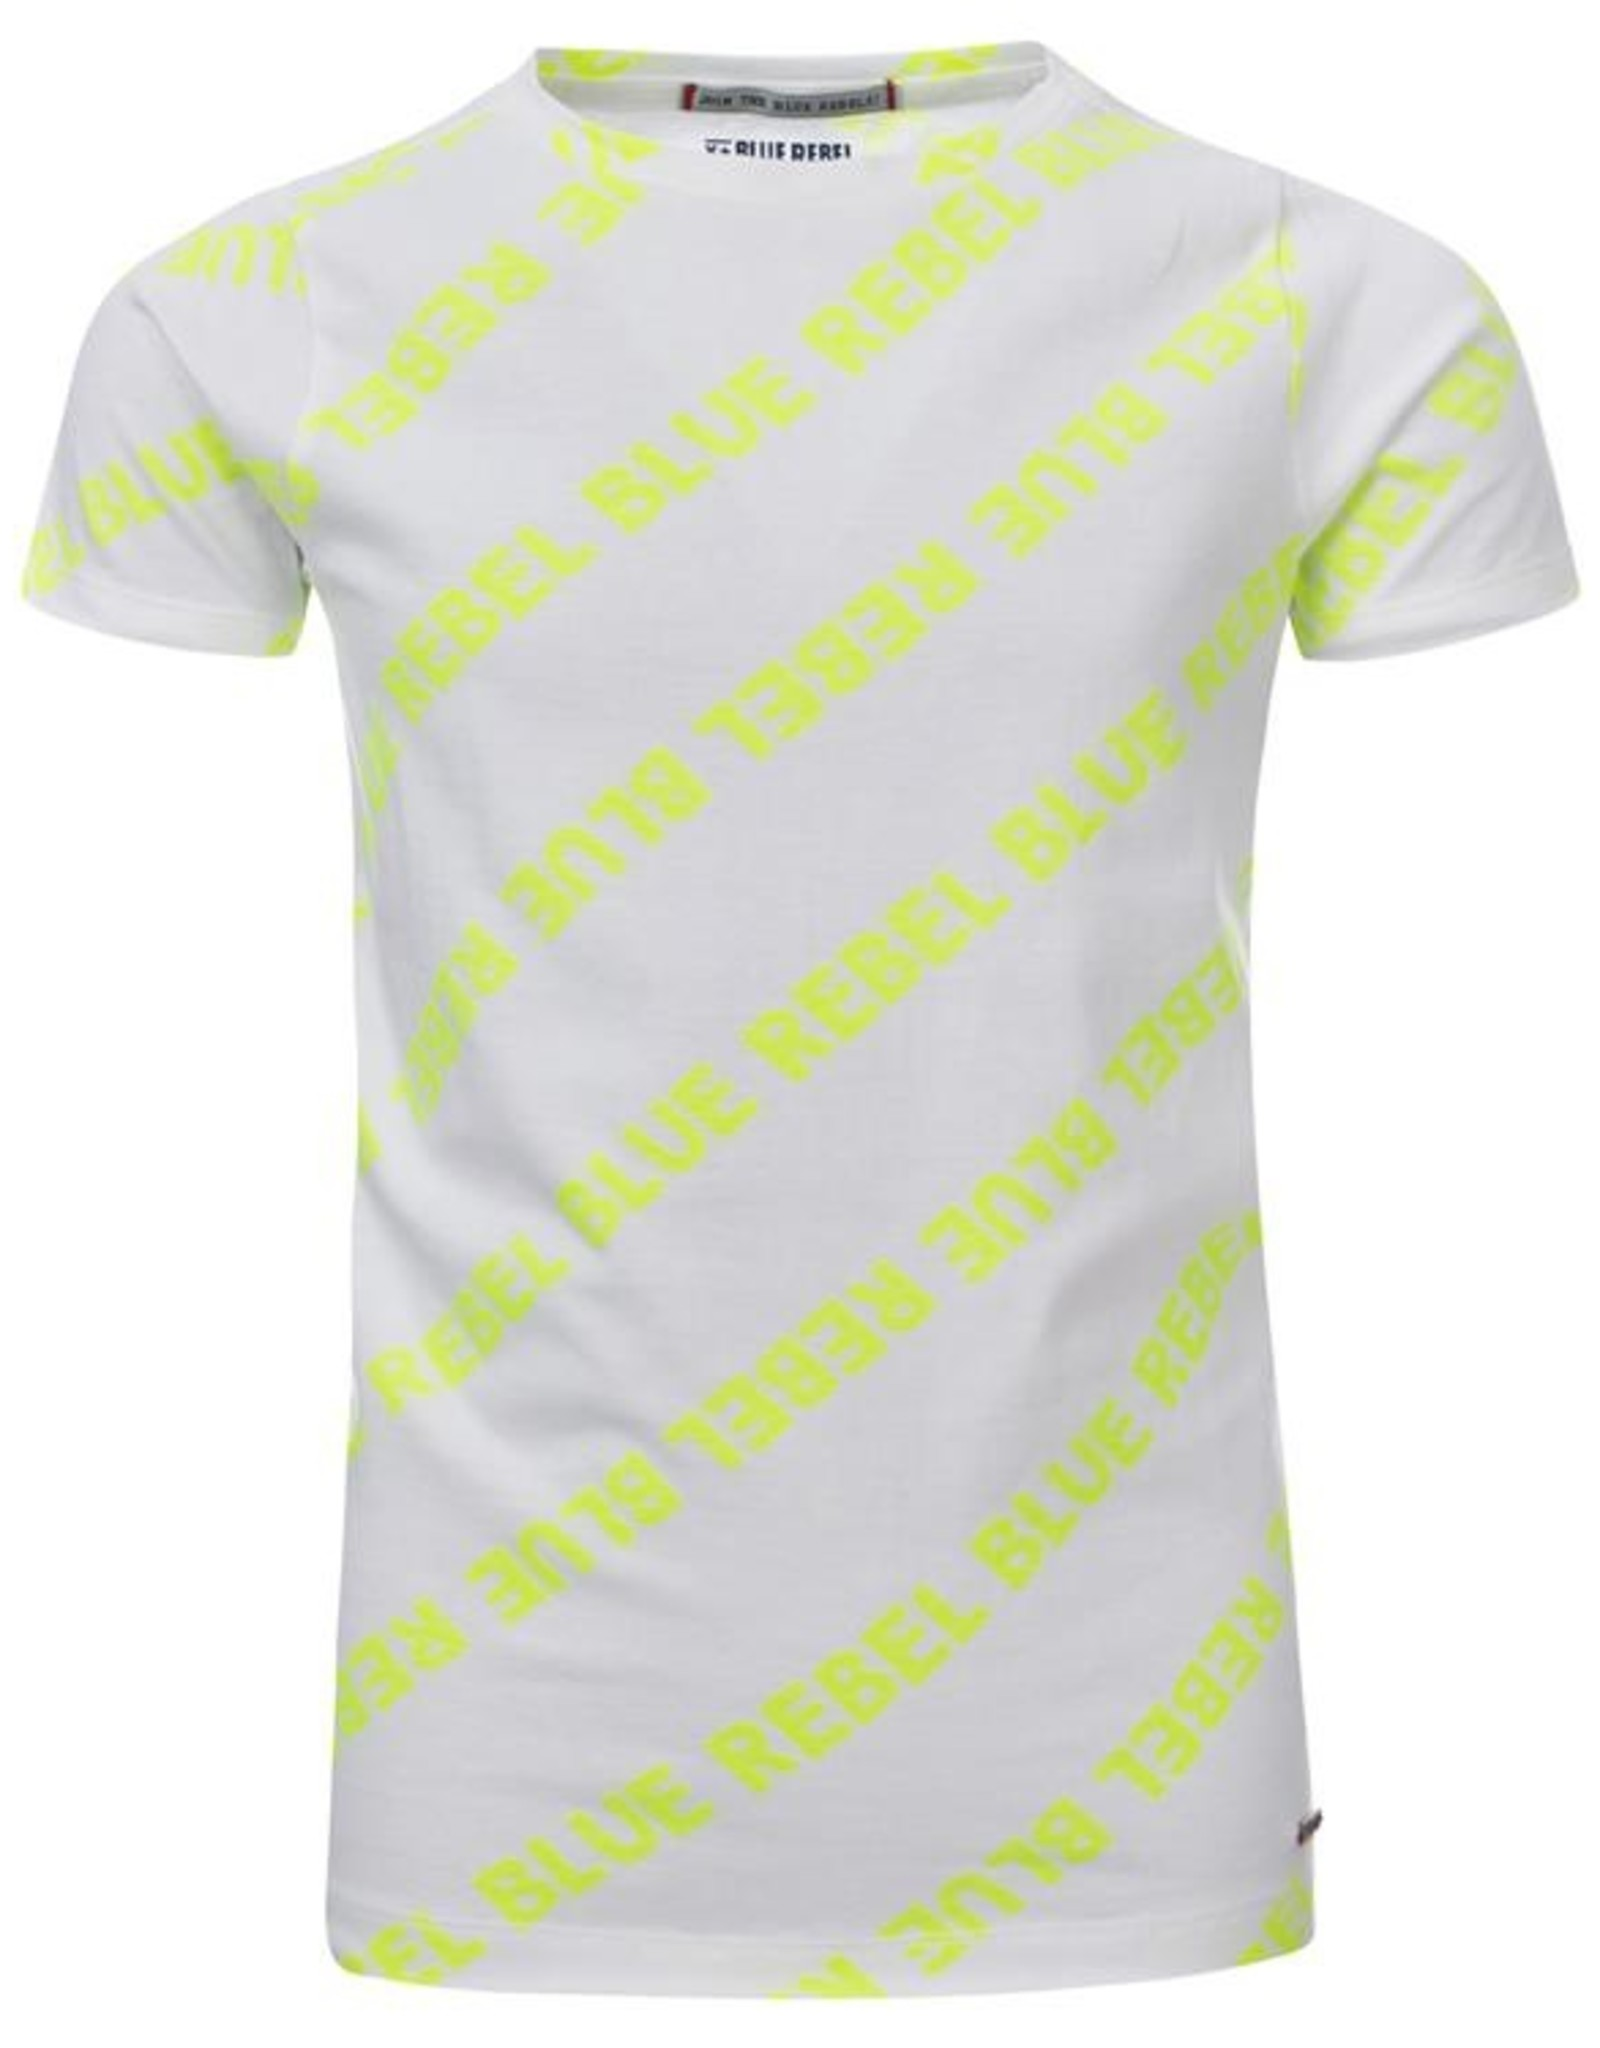 Blue Rebel Jongens t-shirt wit /fluogeel tekst  0136010